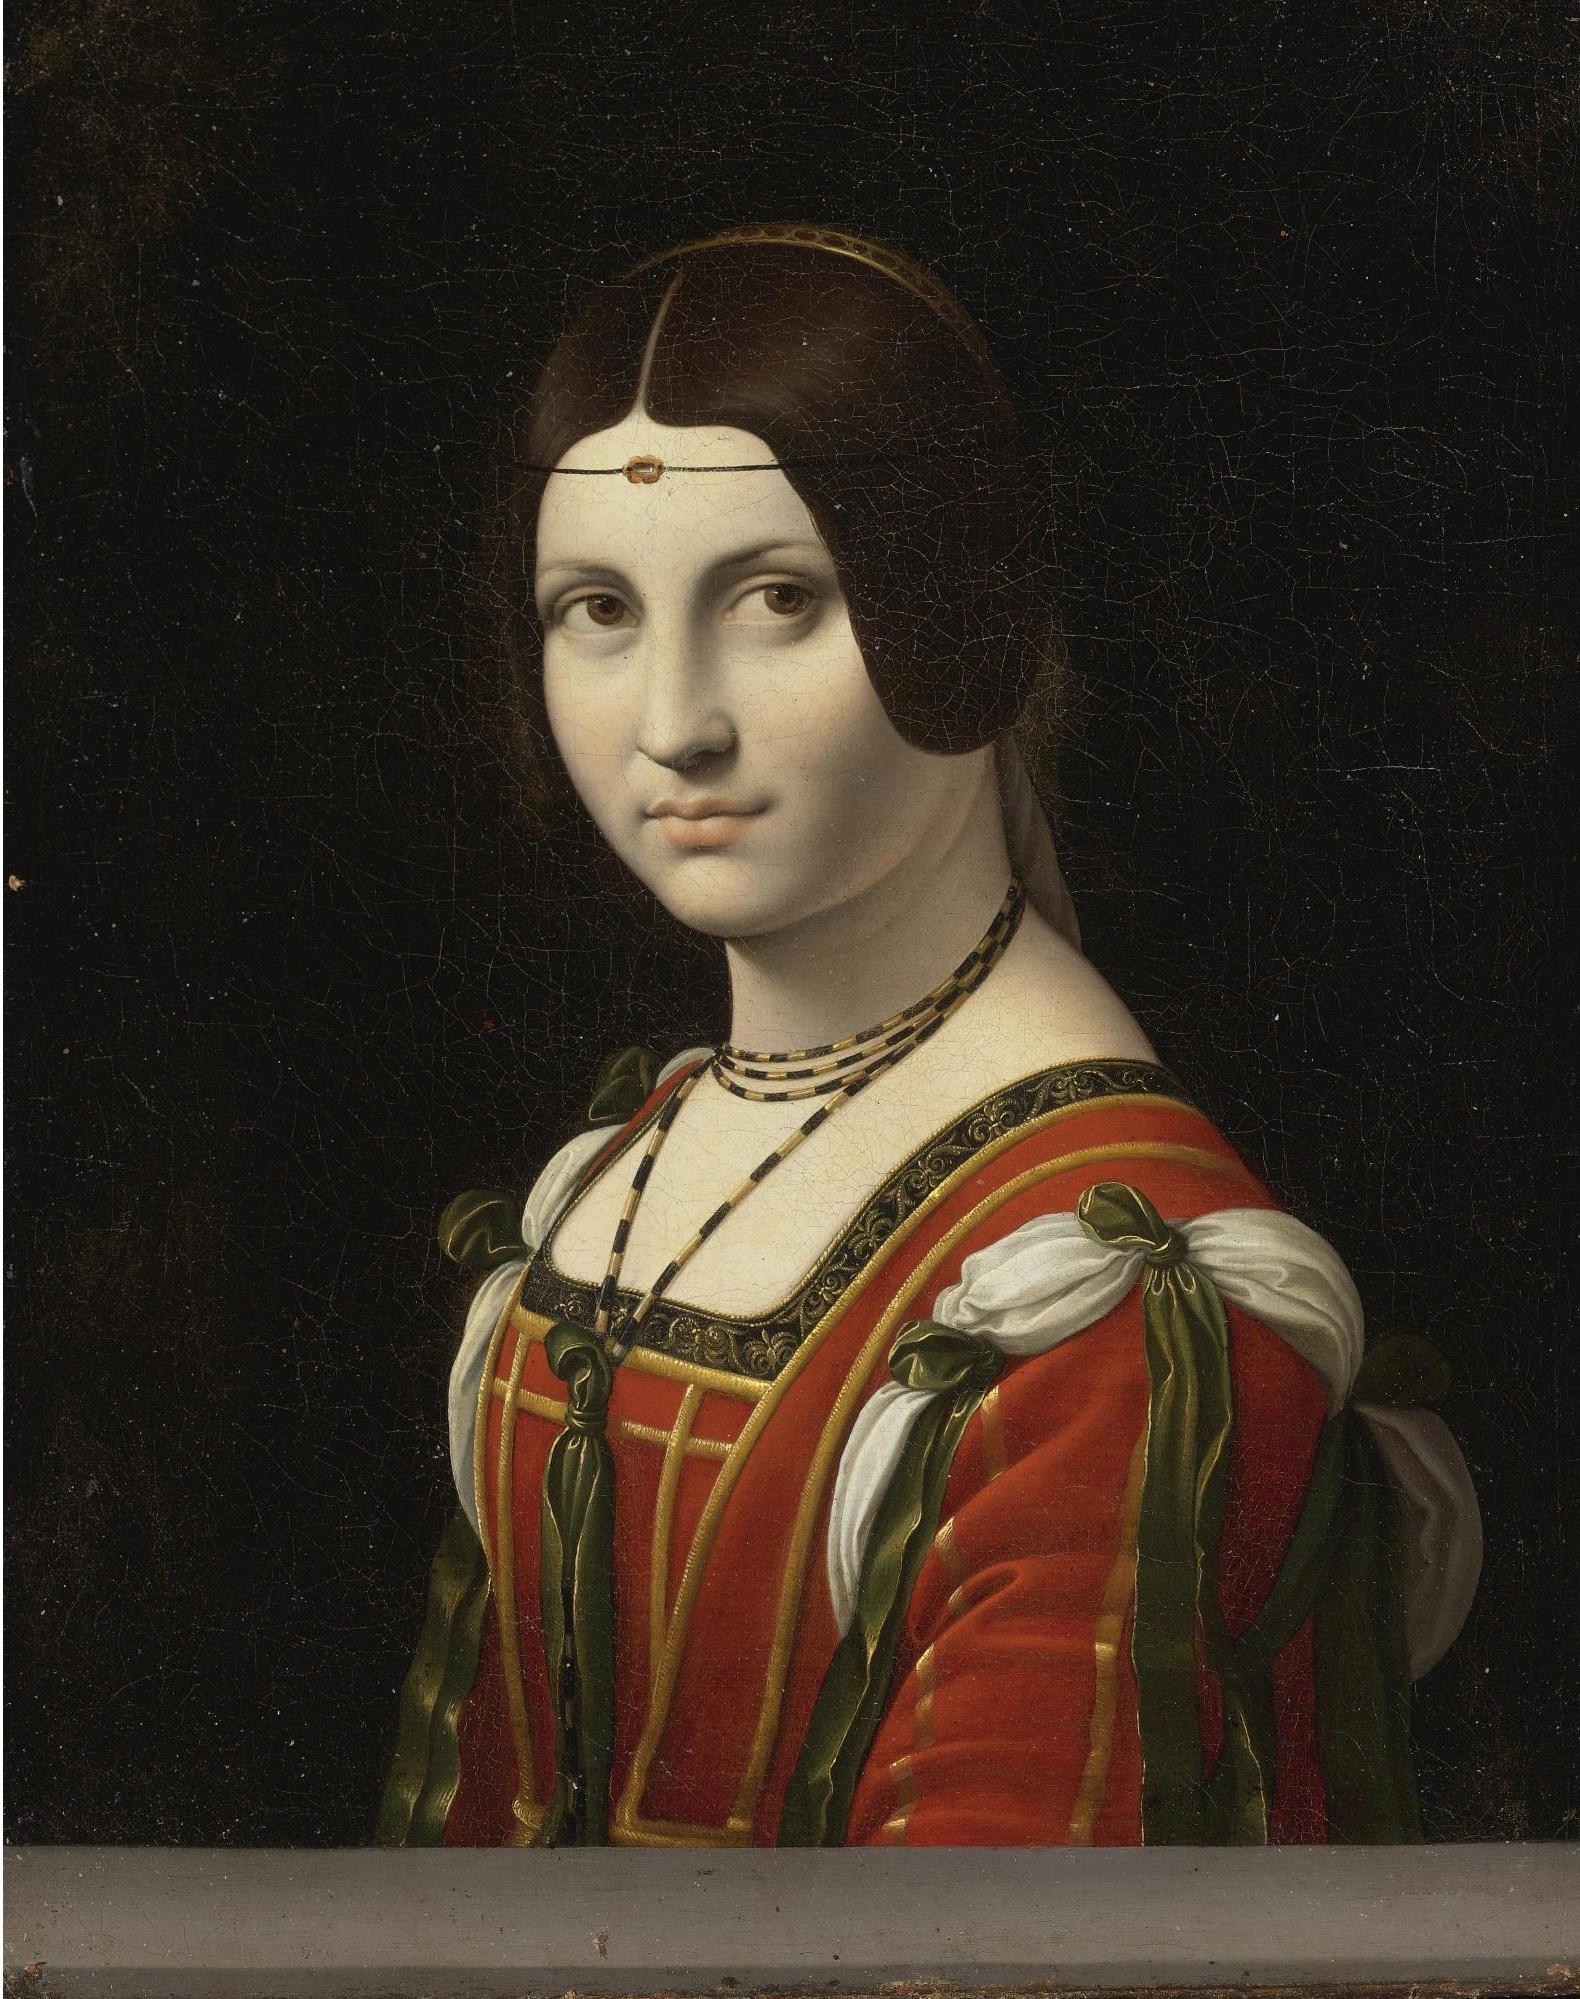 - Figure 1La Belle FerronnièreFollower of Leonardo da Vinci, probably before 1750Oil on canvas